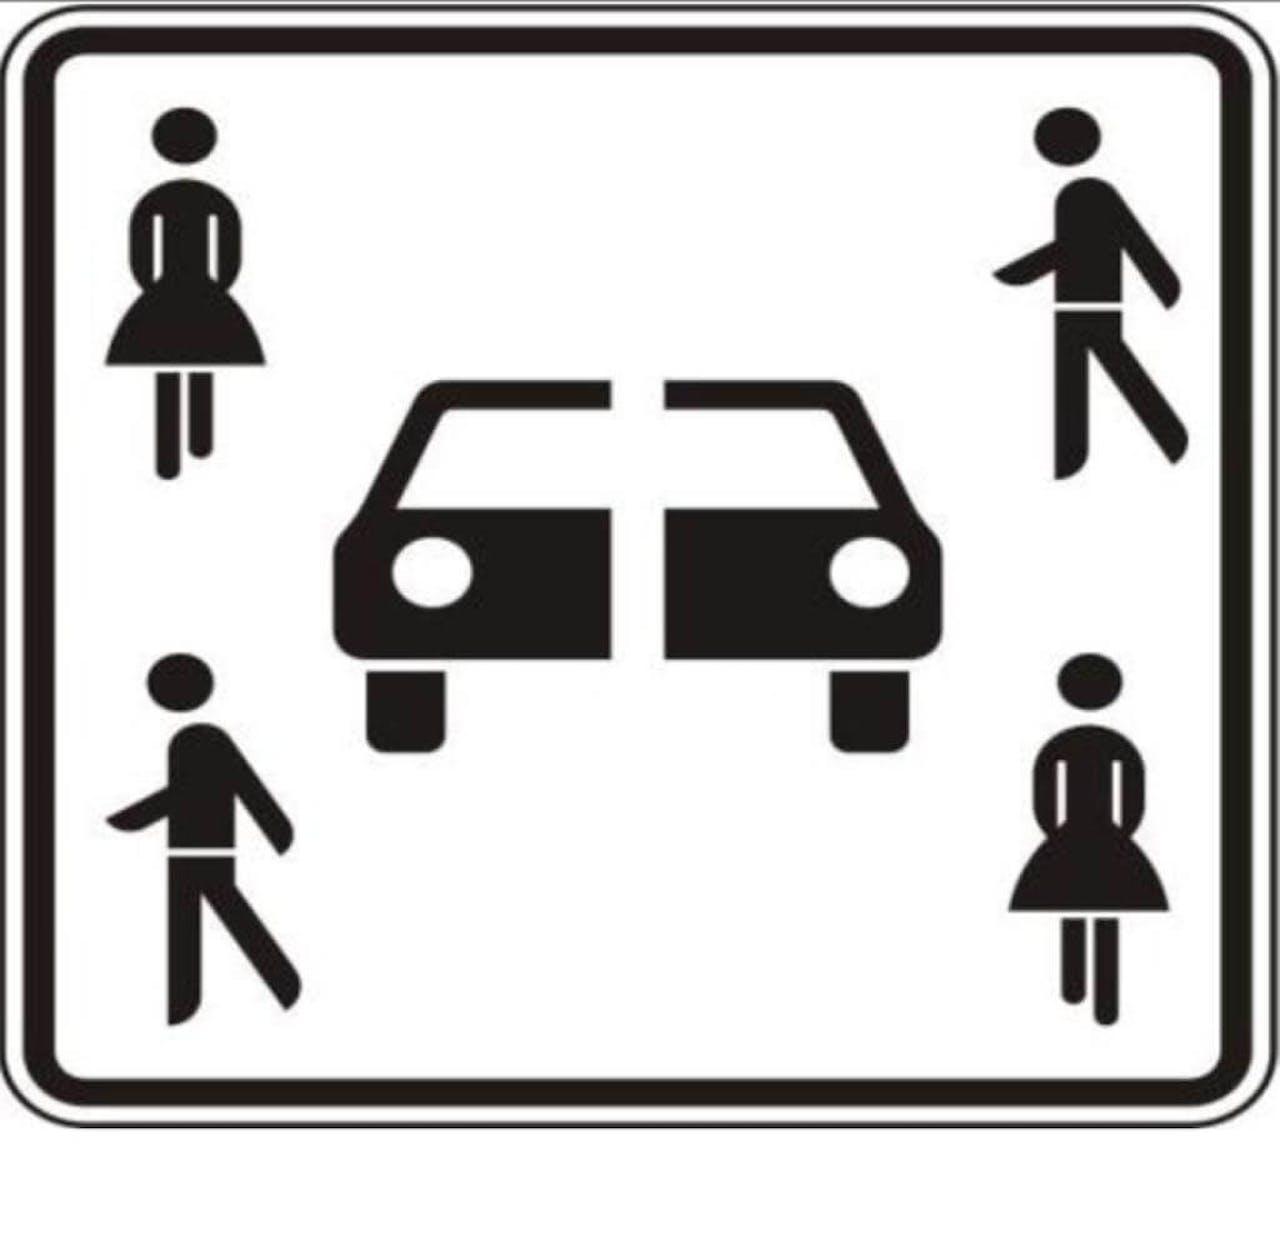 Neues Verkehrsschild Carsharing Parkplatz